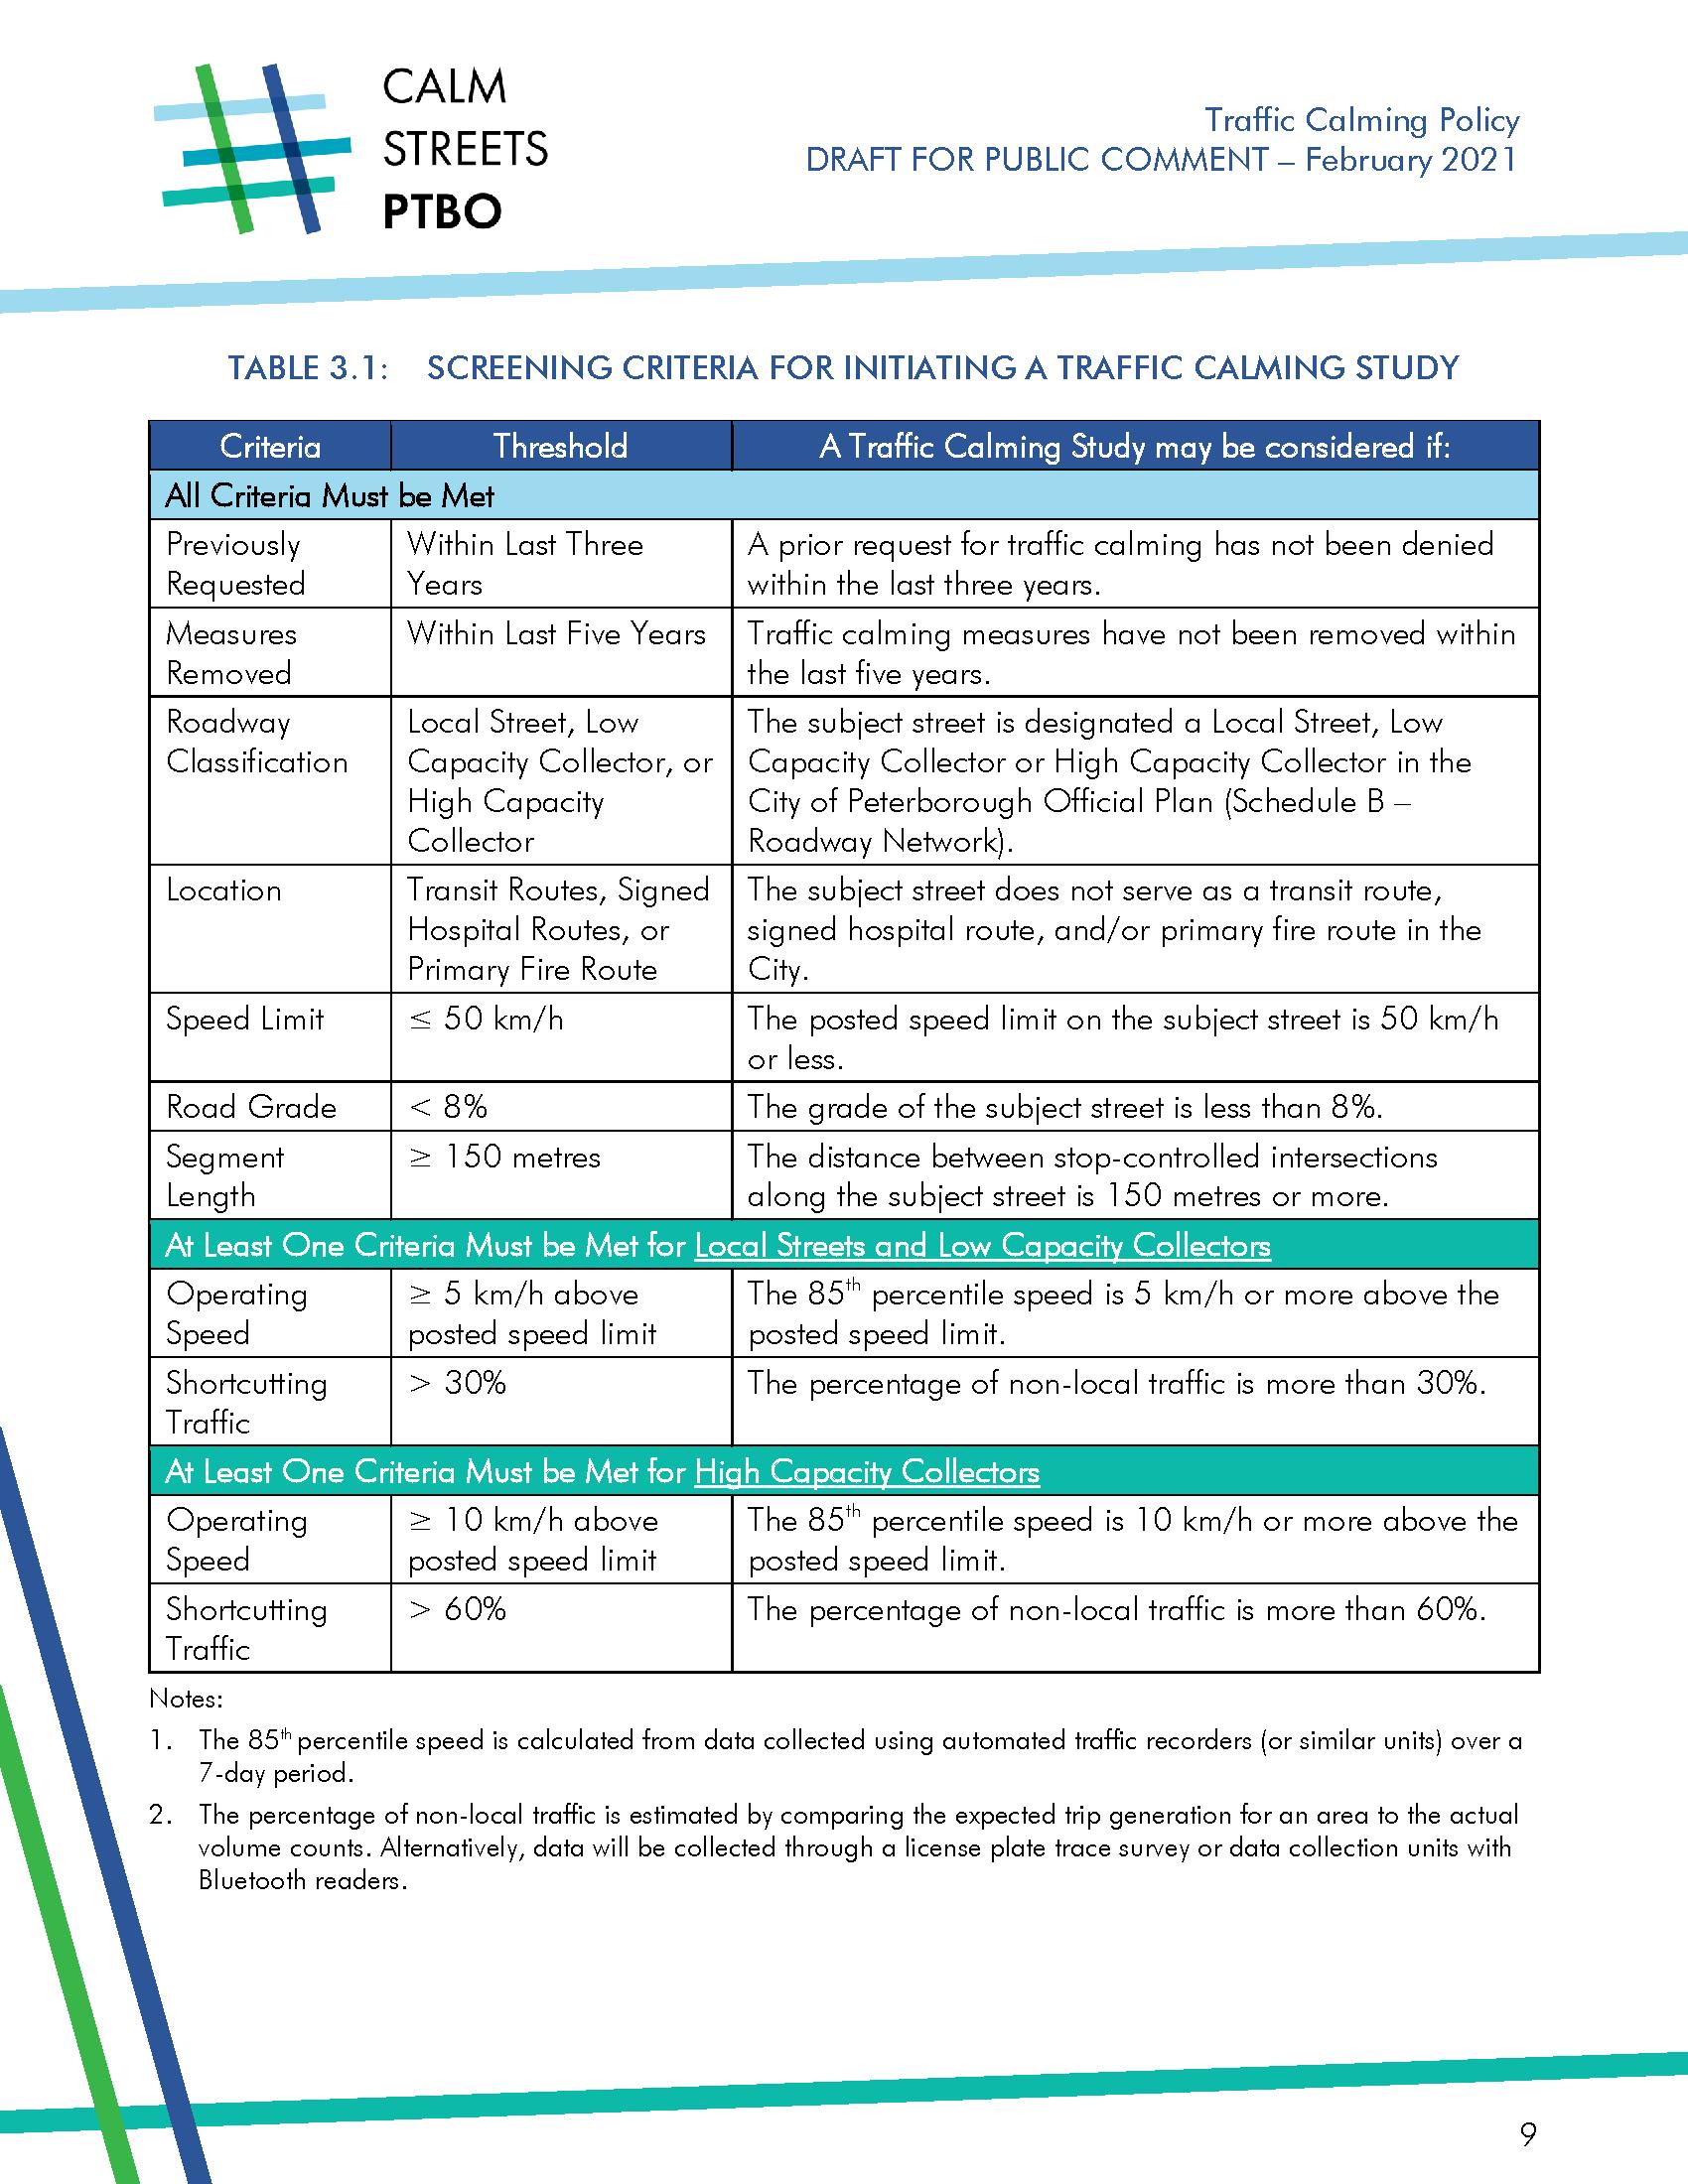 Draft screening criteria for initiating a Traffic Calming Study